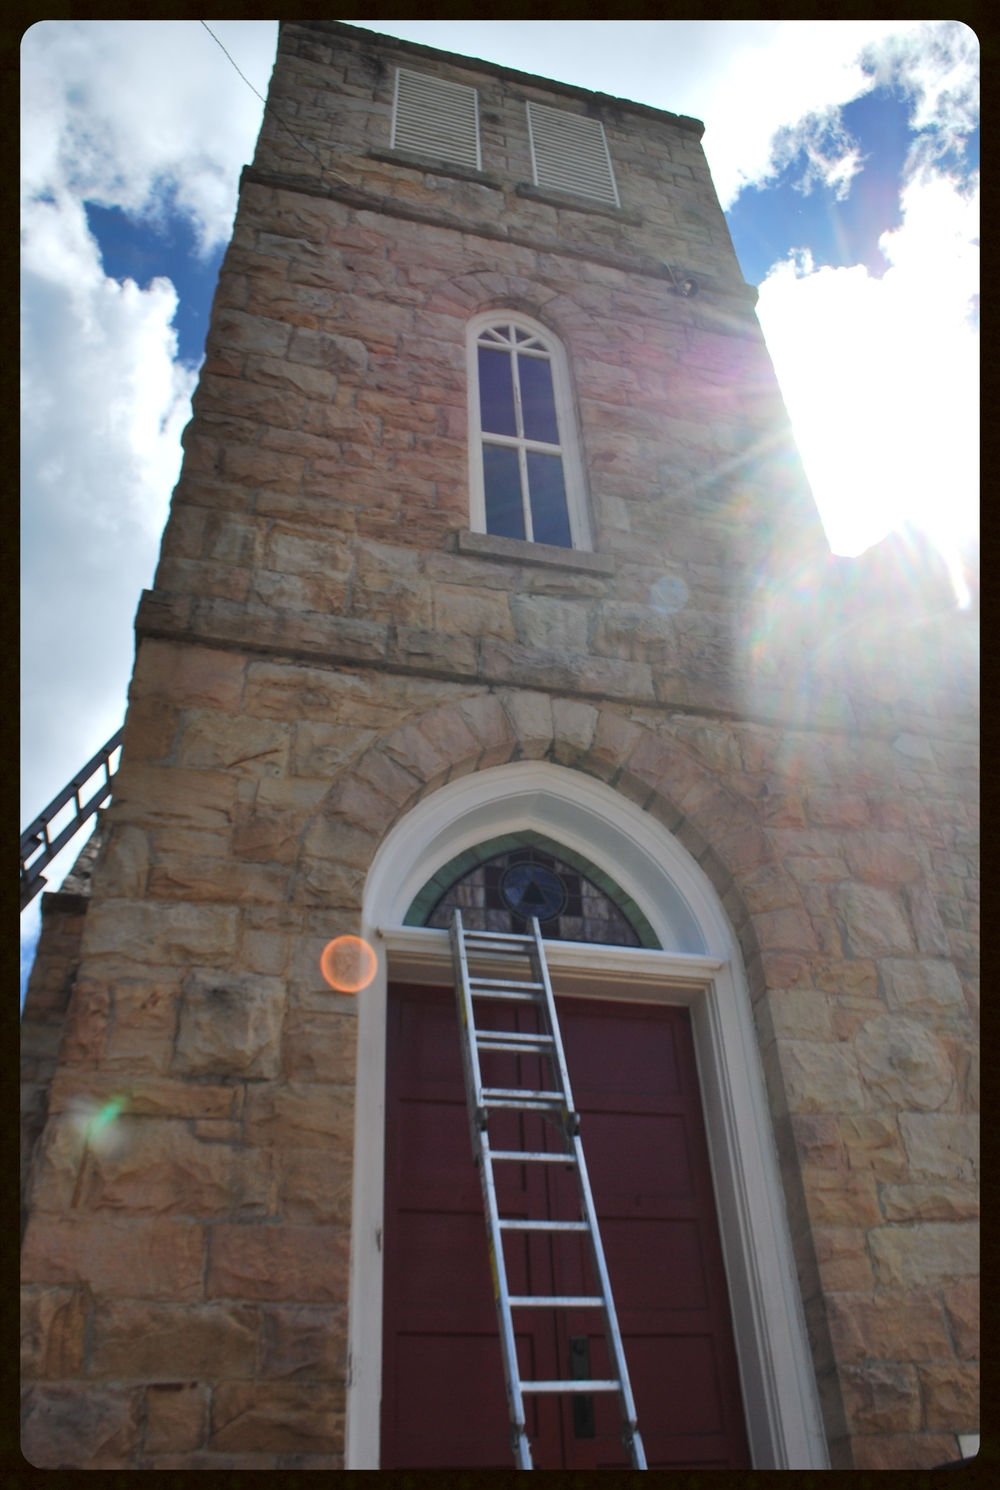 Photo of the window restoration work